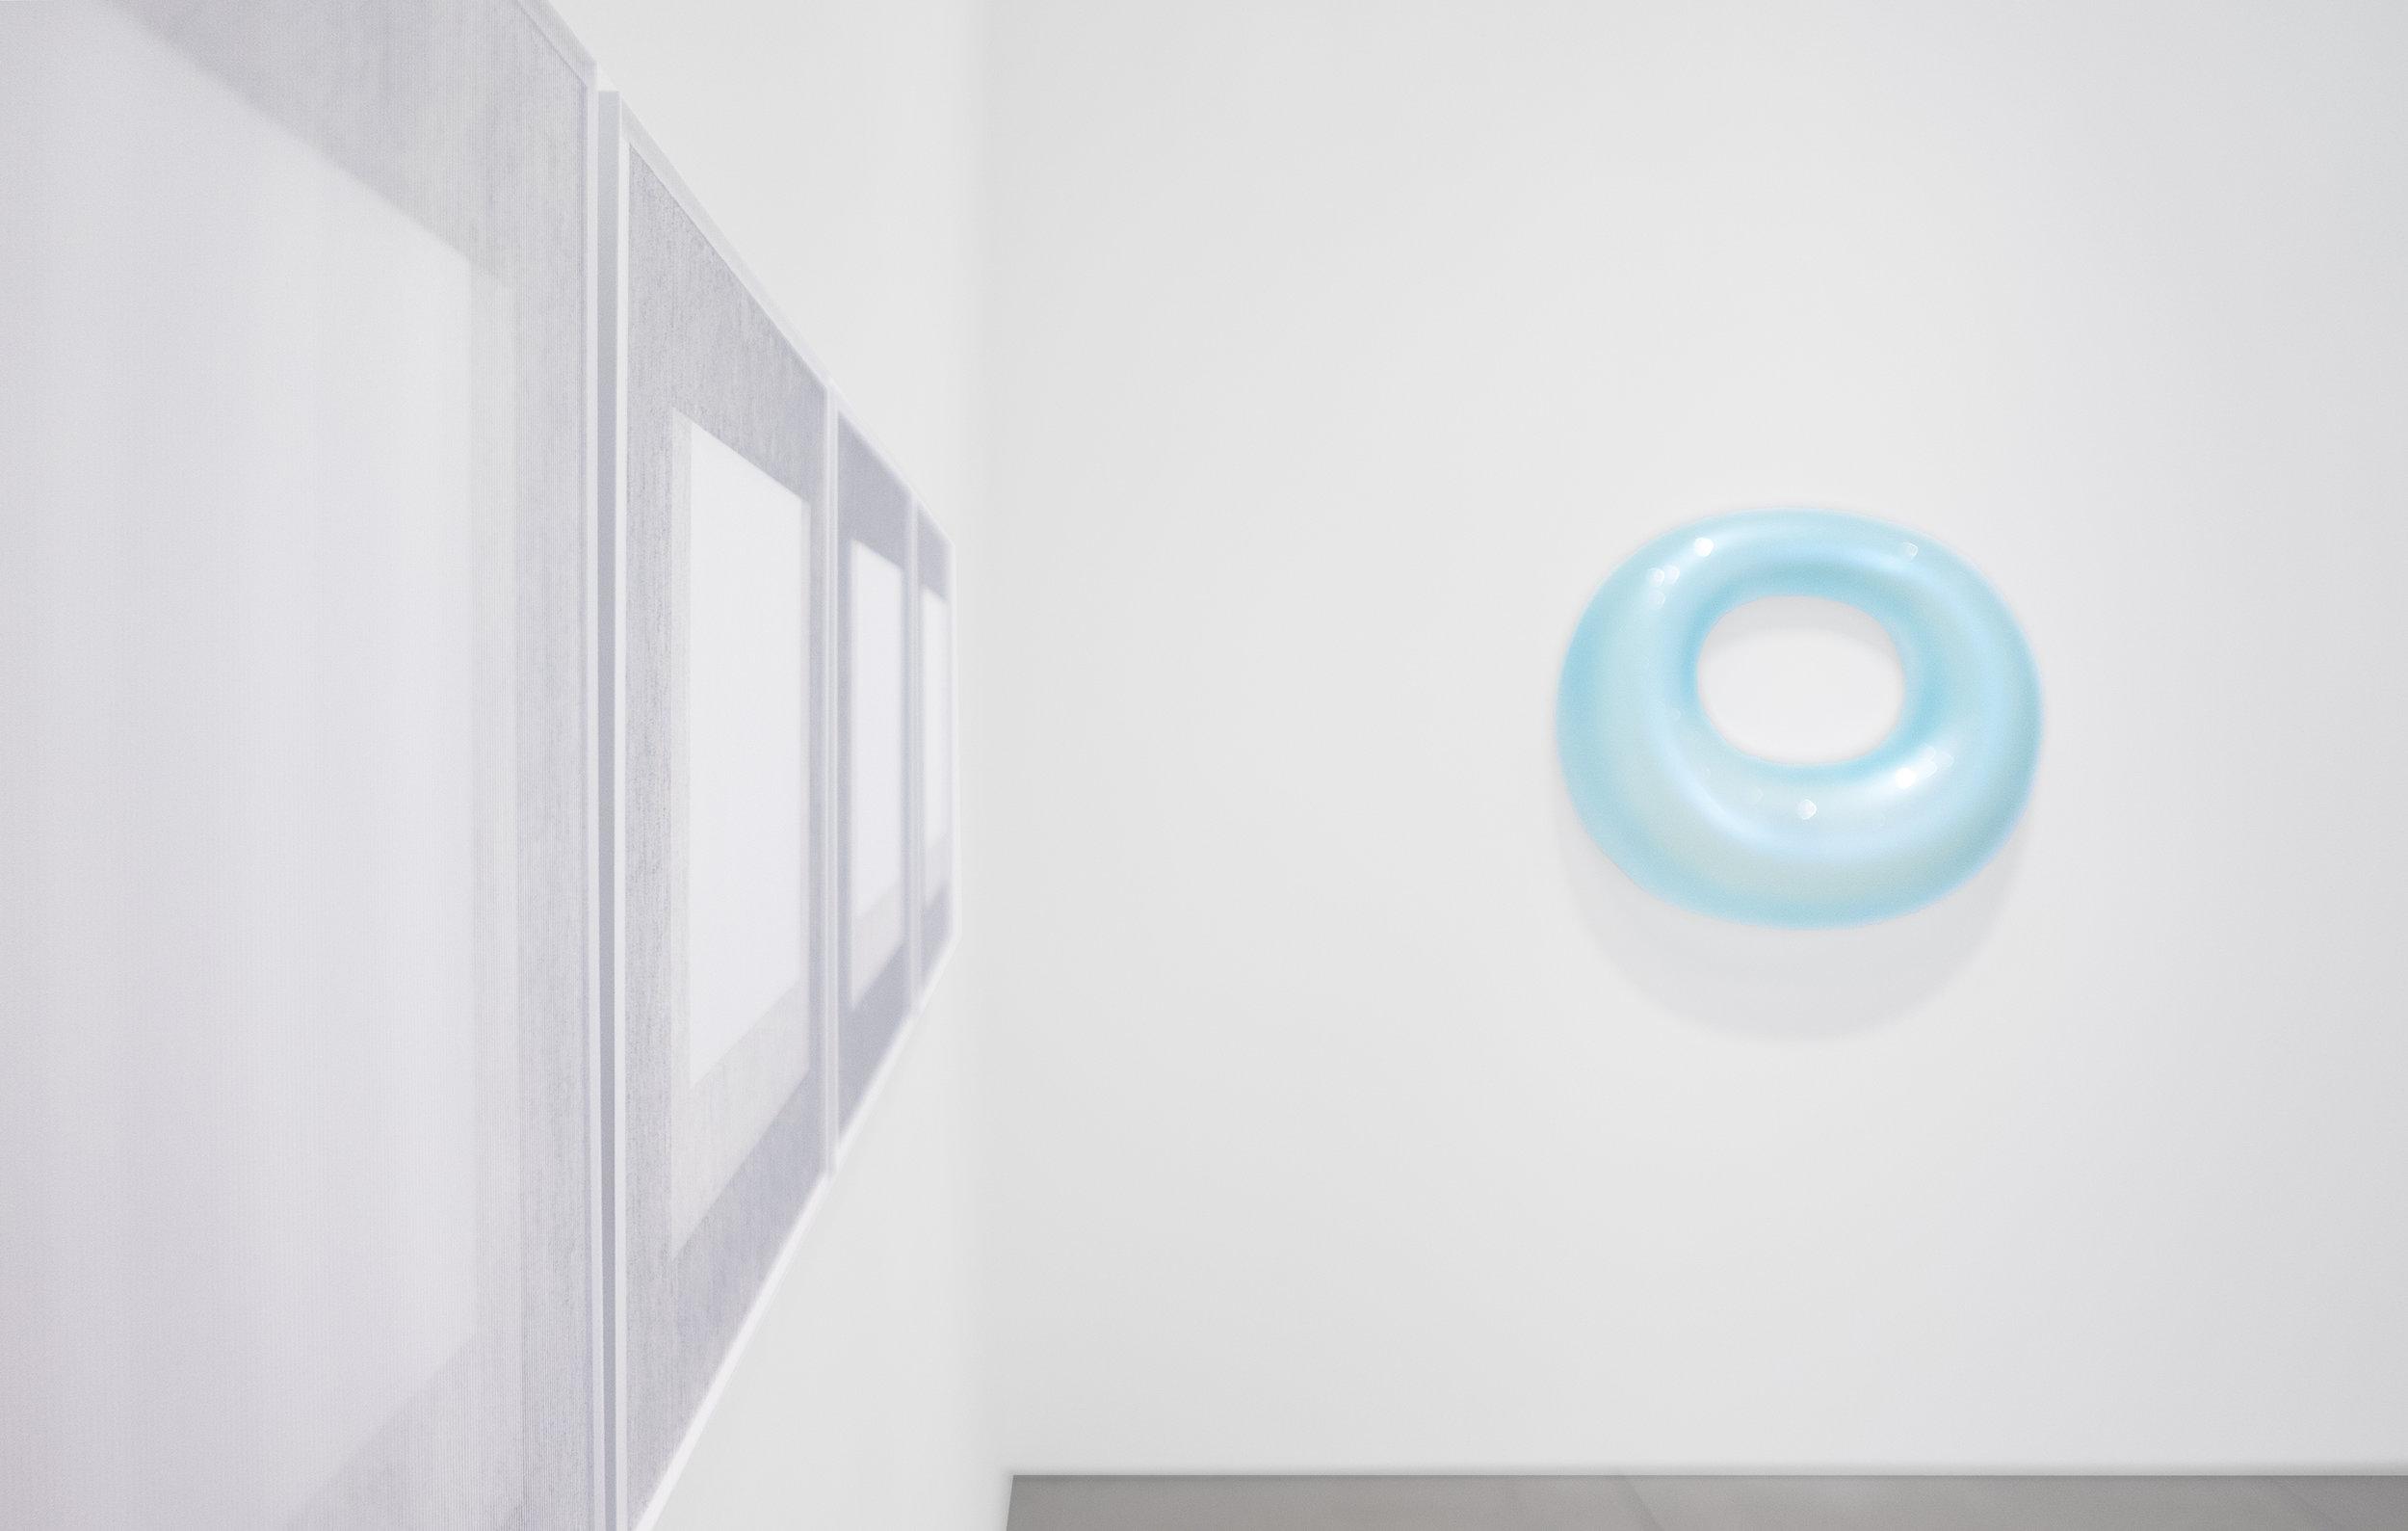 25 Years_Peter Blake Gallery_2019_Installation View_23.jpg